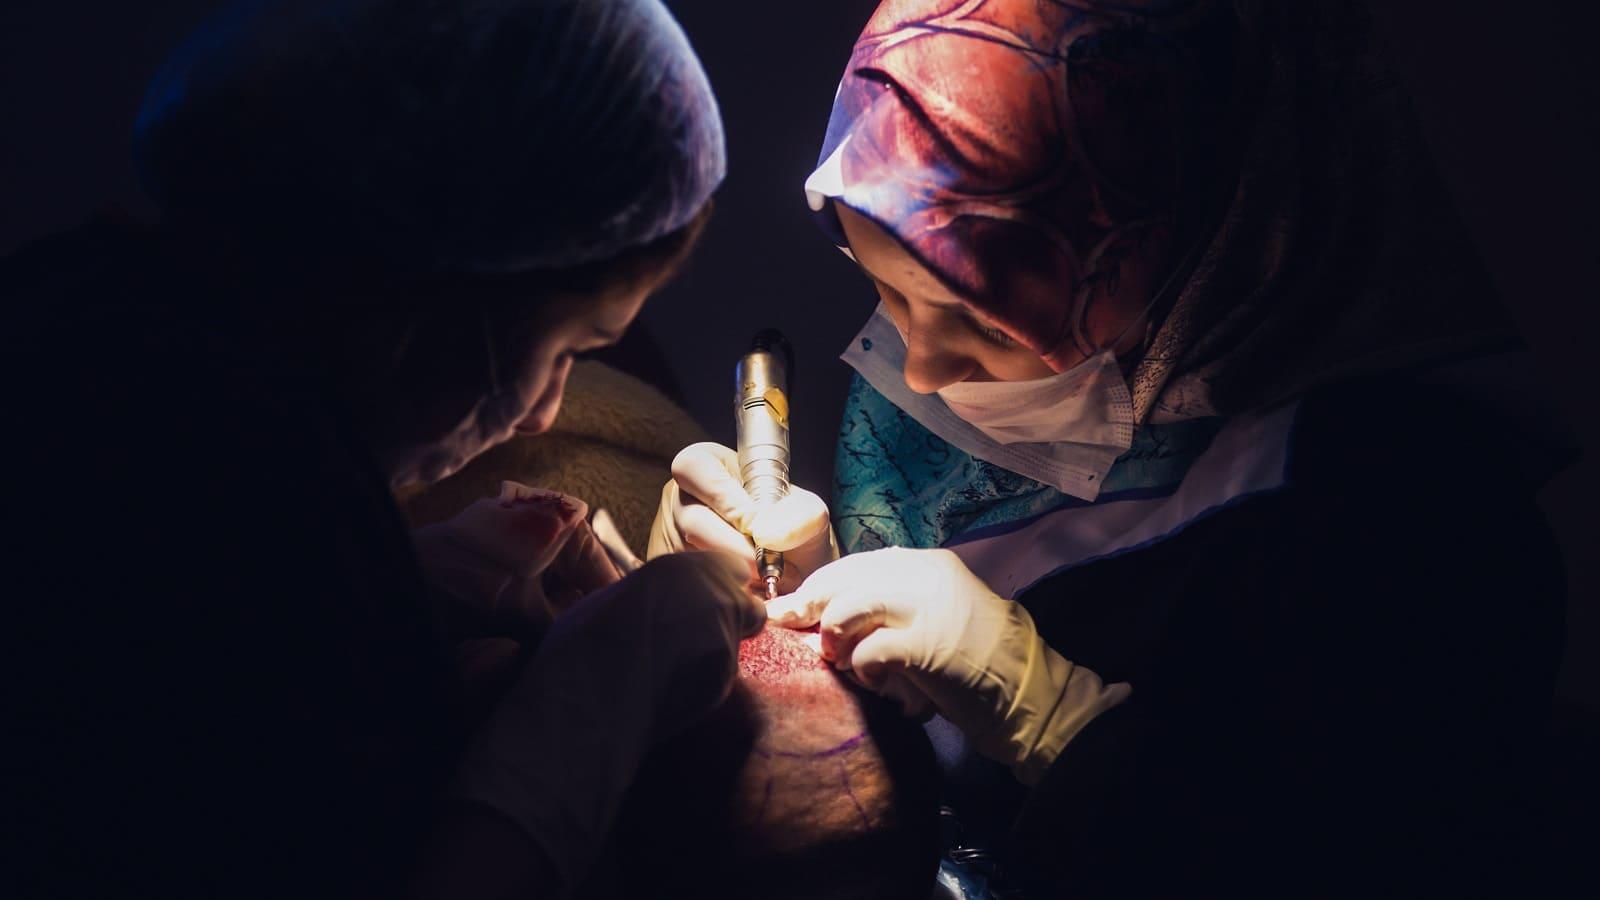 Haartransplantation negative Erfahrung